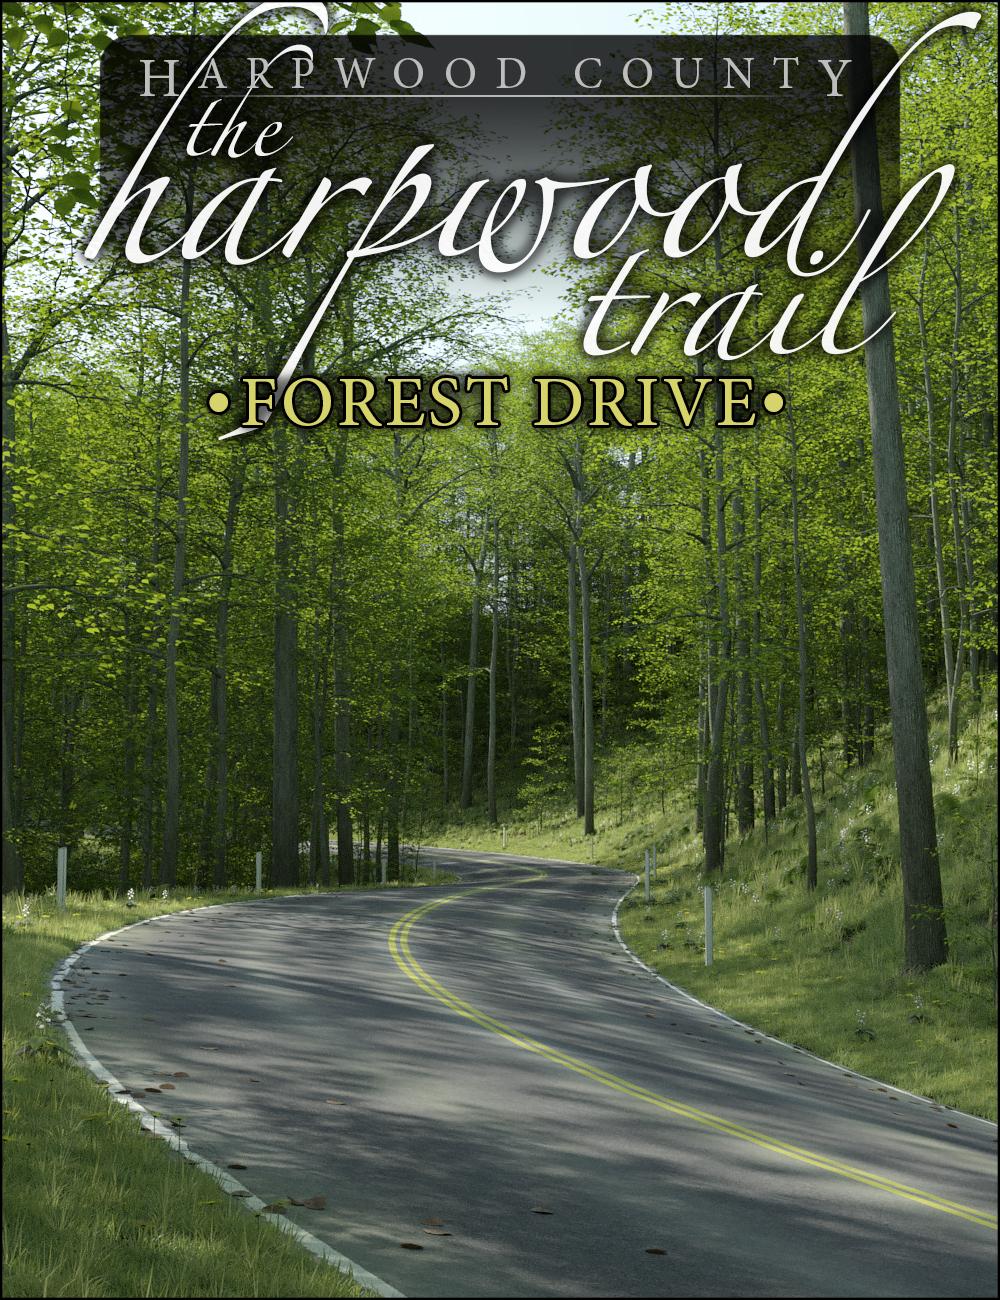 The Harpwood Trail - Forest Drive by: HowieFarkes, 3D Models by Daz 3D